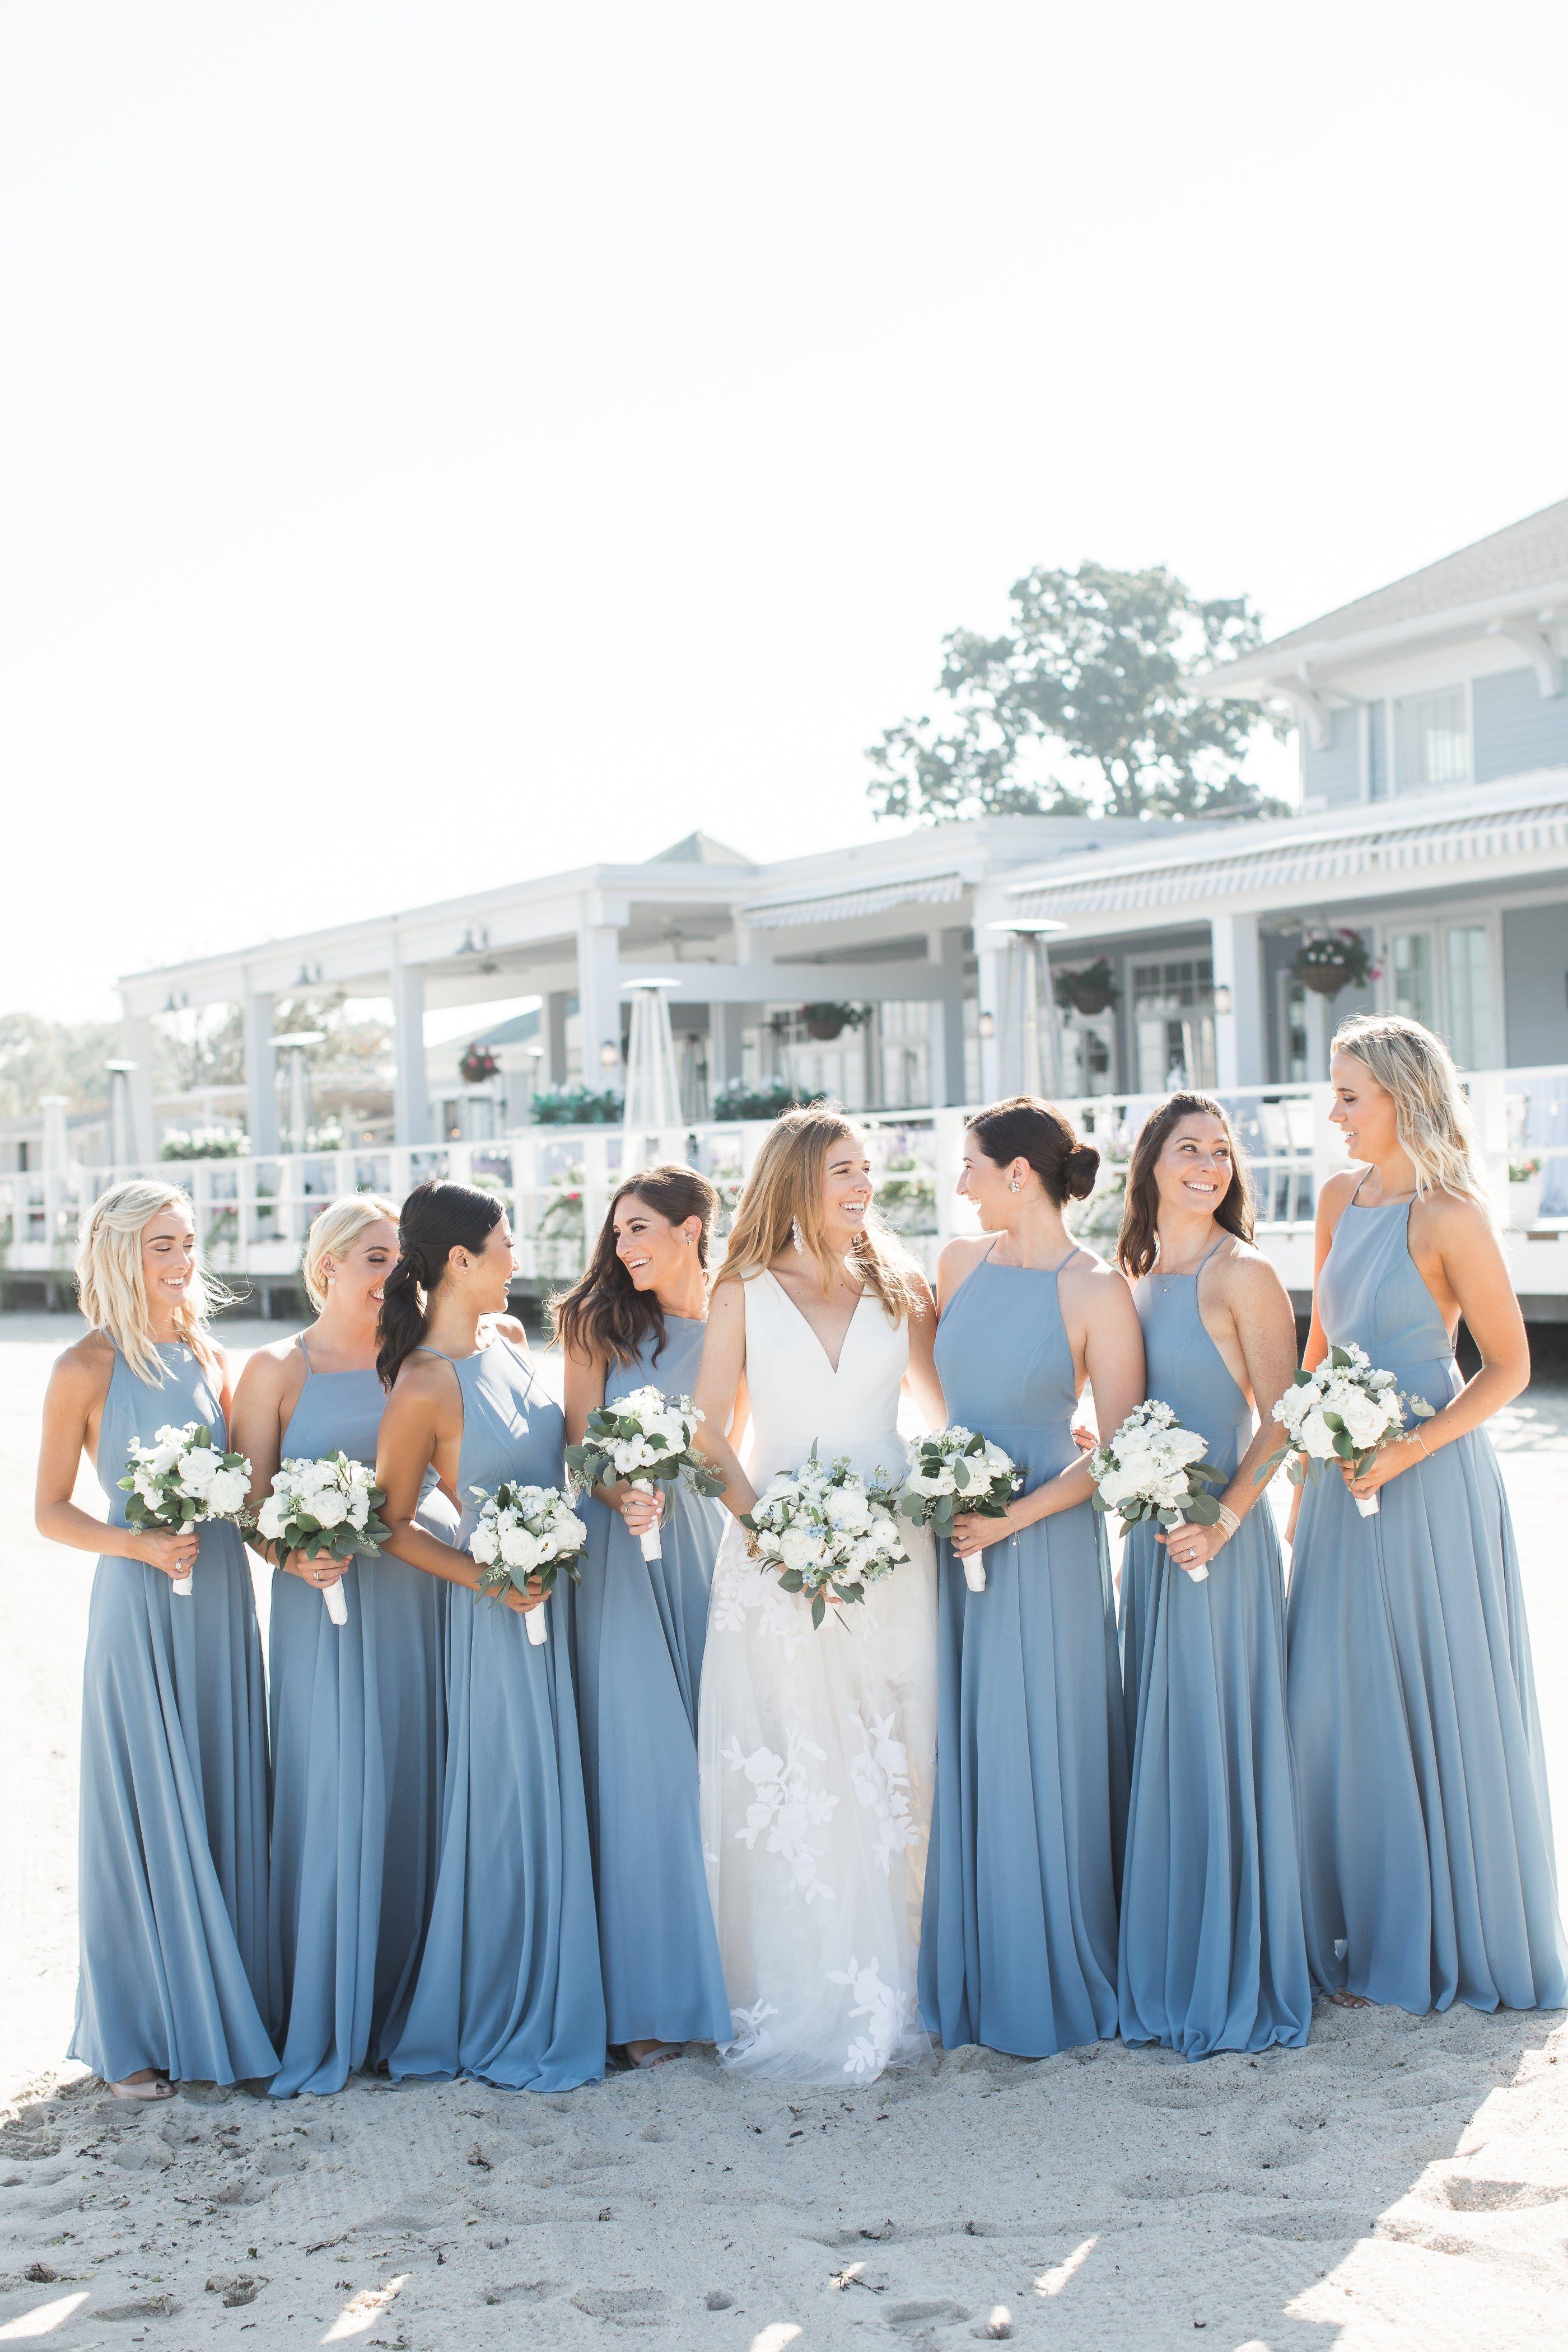 Beautiful Blues Stunning Watercolors Makes This Summer Wedding